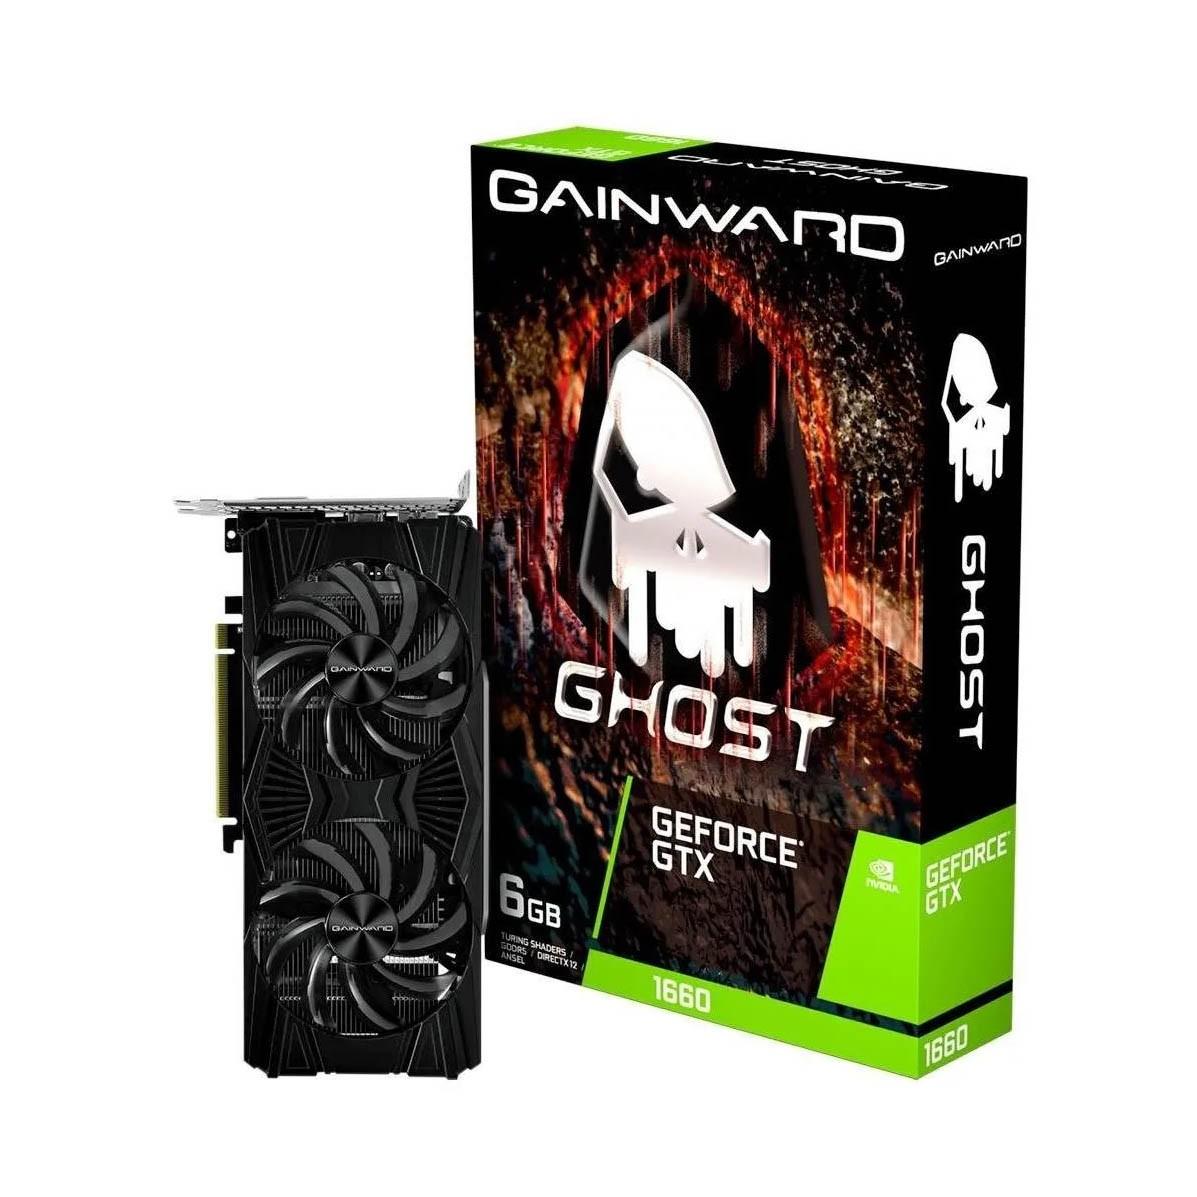 Placa De Video Gainward Geforce Gtx 1660 6gb Ghost Gddr5 - NE51660018J9-1161X